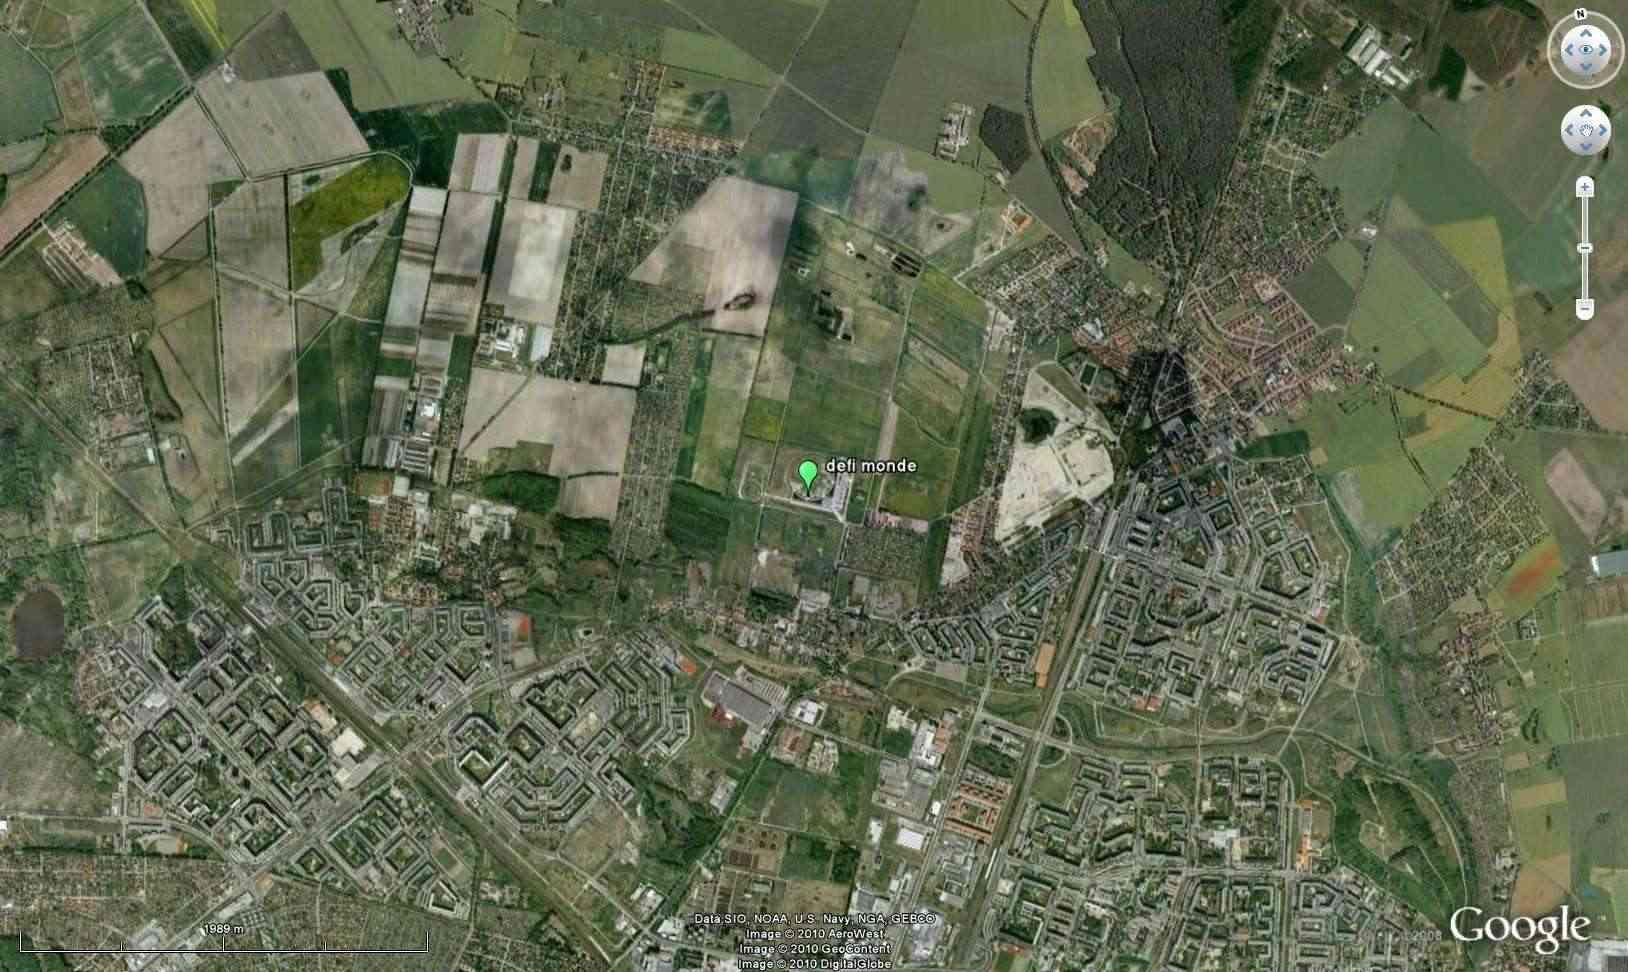 DEFIS ZOOOOOOM Monde A121 à A156 (Mars/Août 2010) - Page 39 Aaa_de12